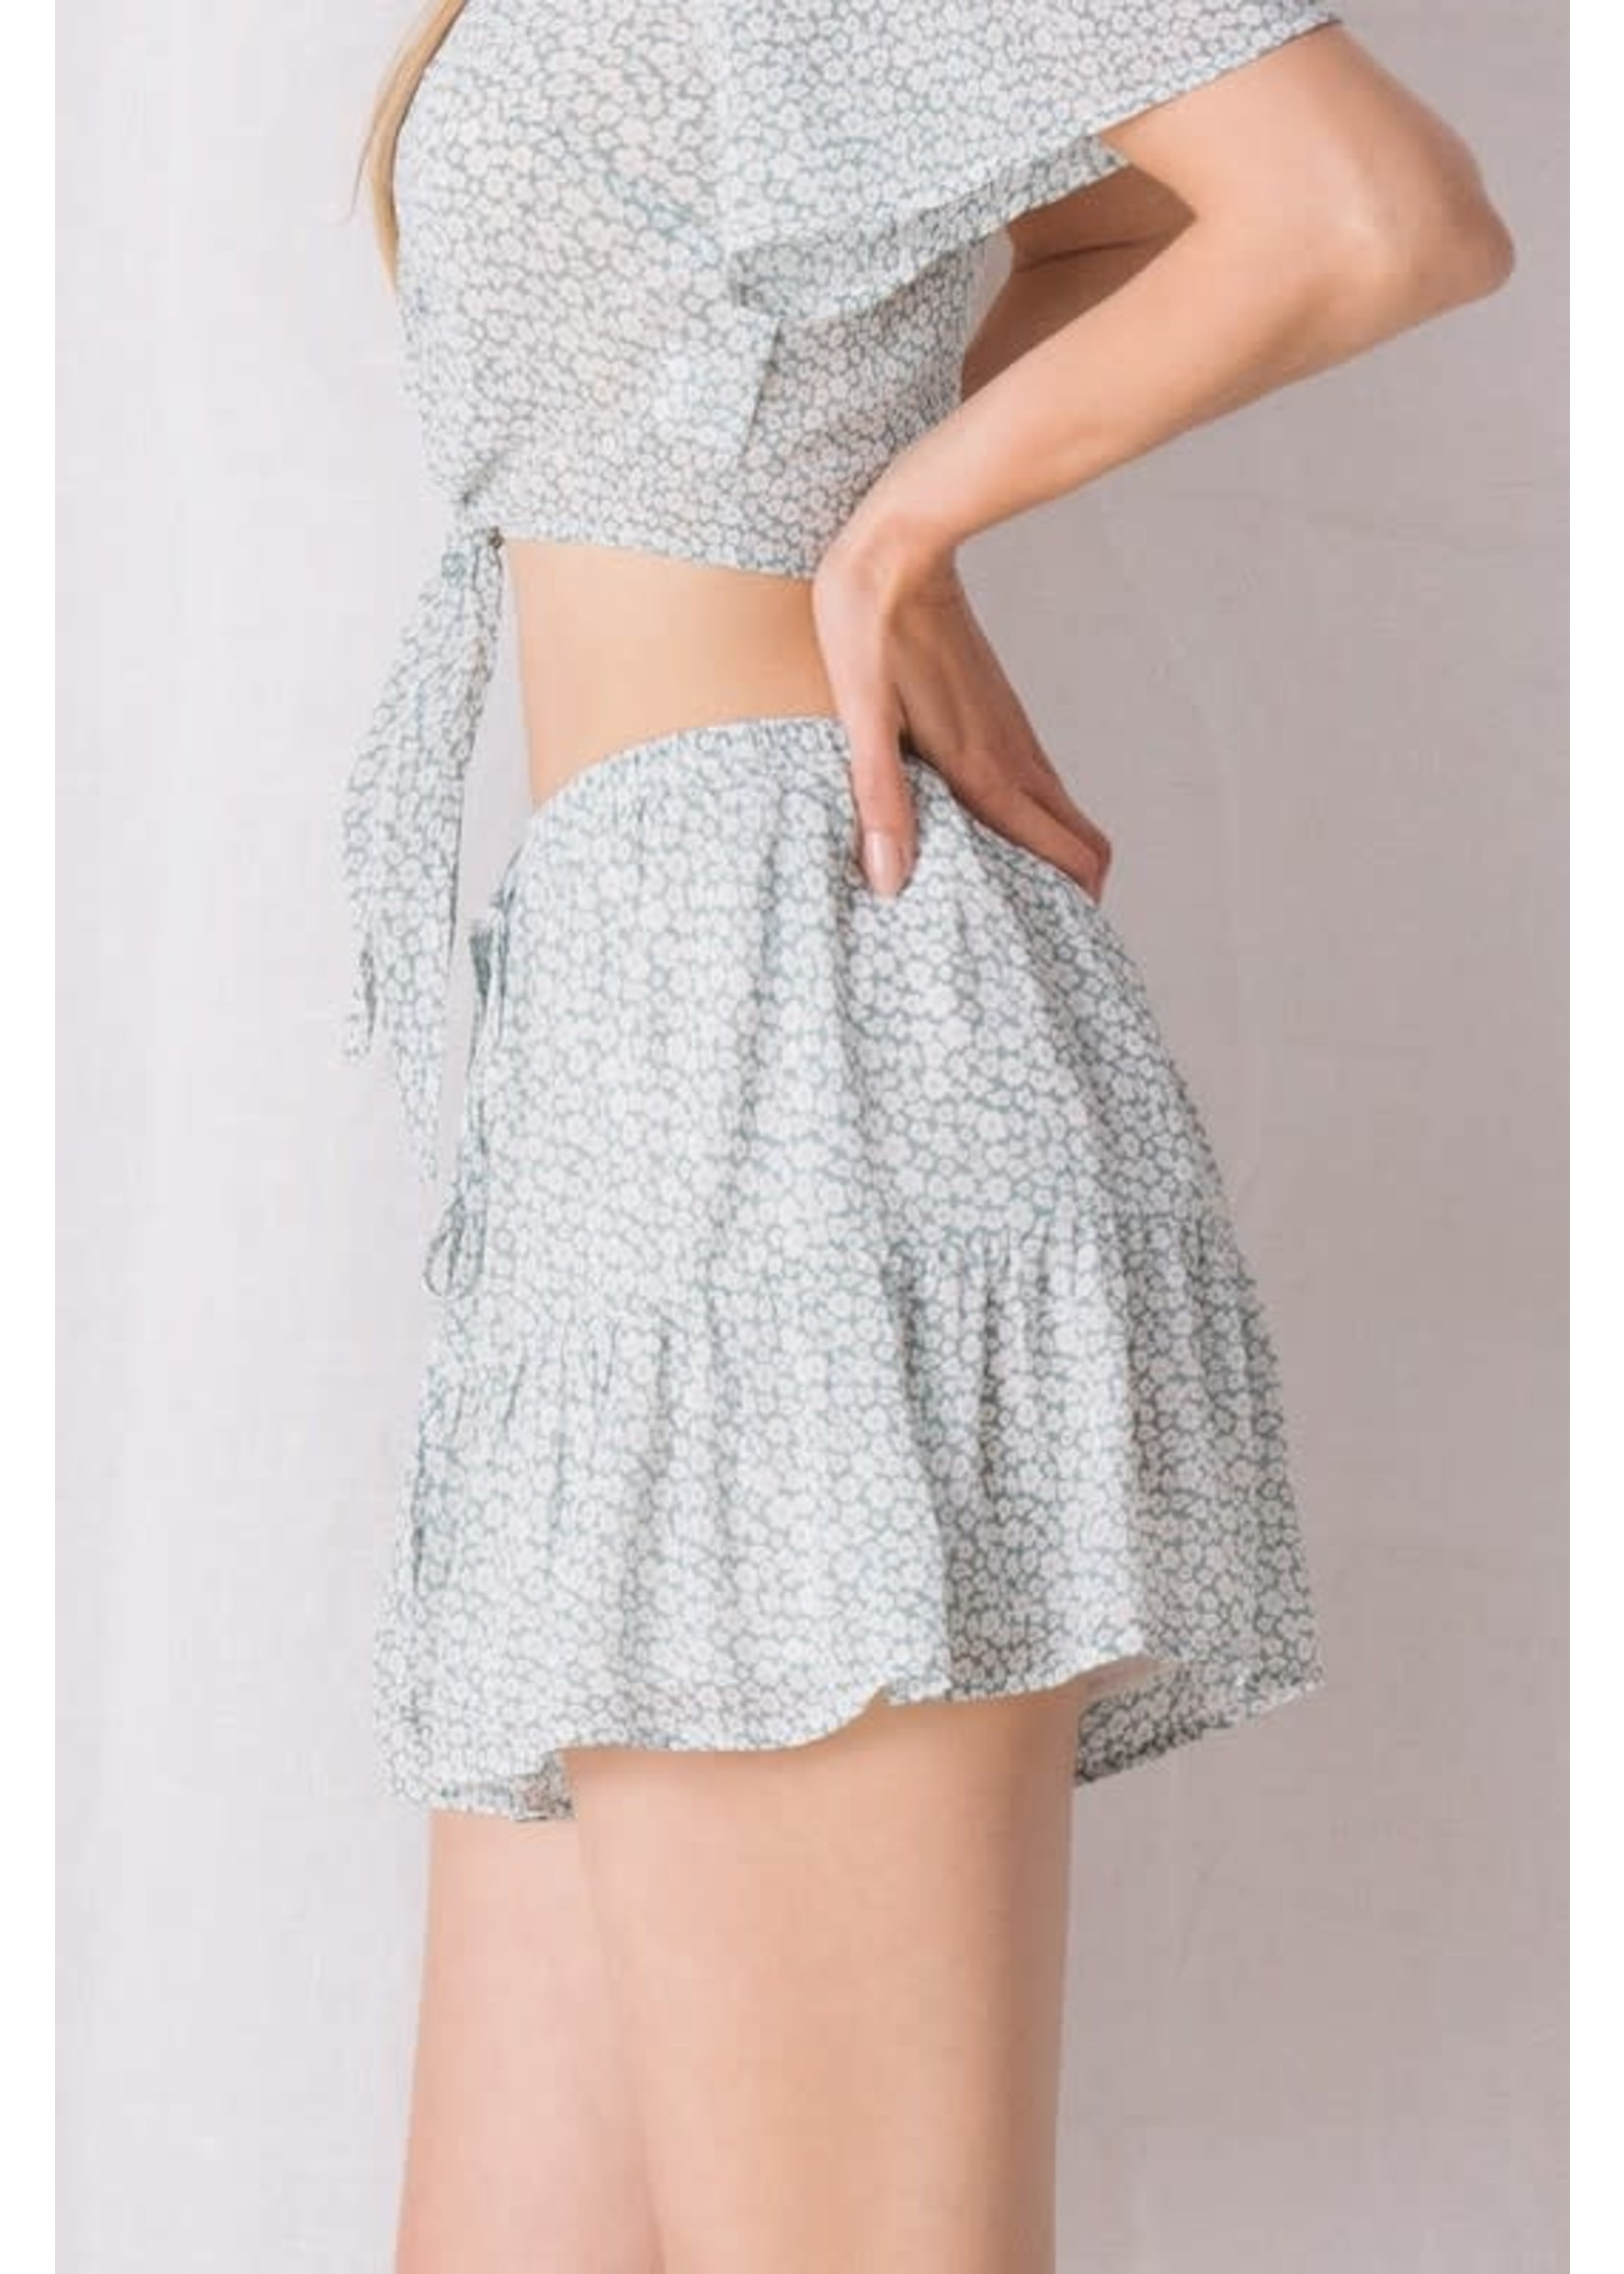 Storia Tiny Floral Ruffled Shorts - JP3288